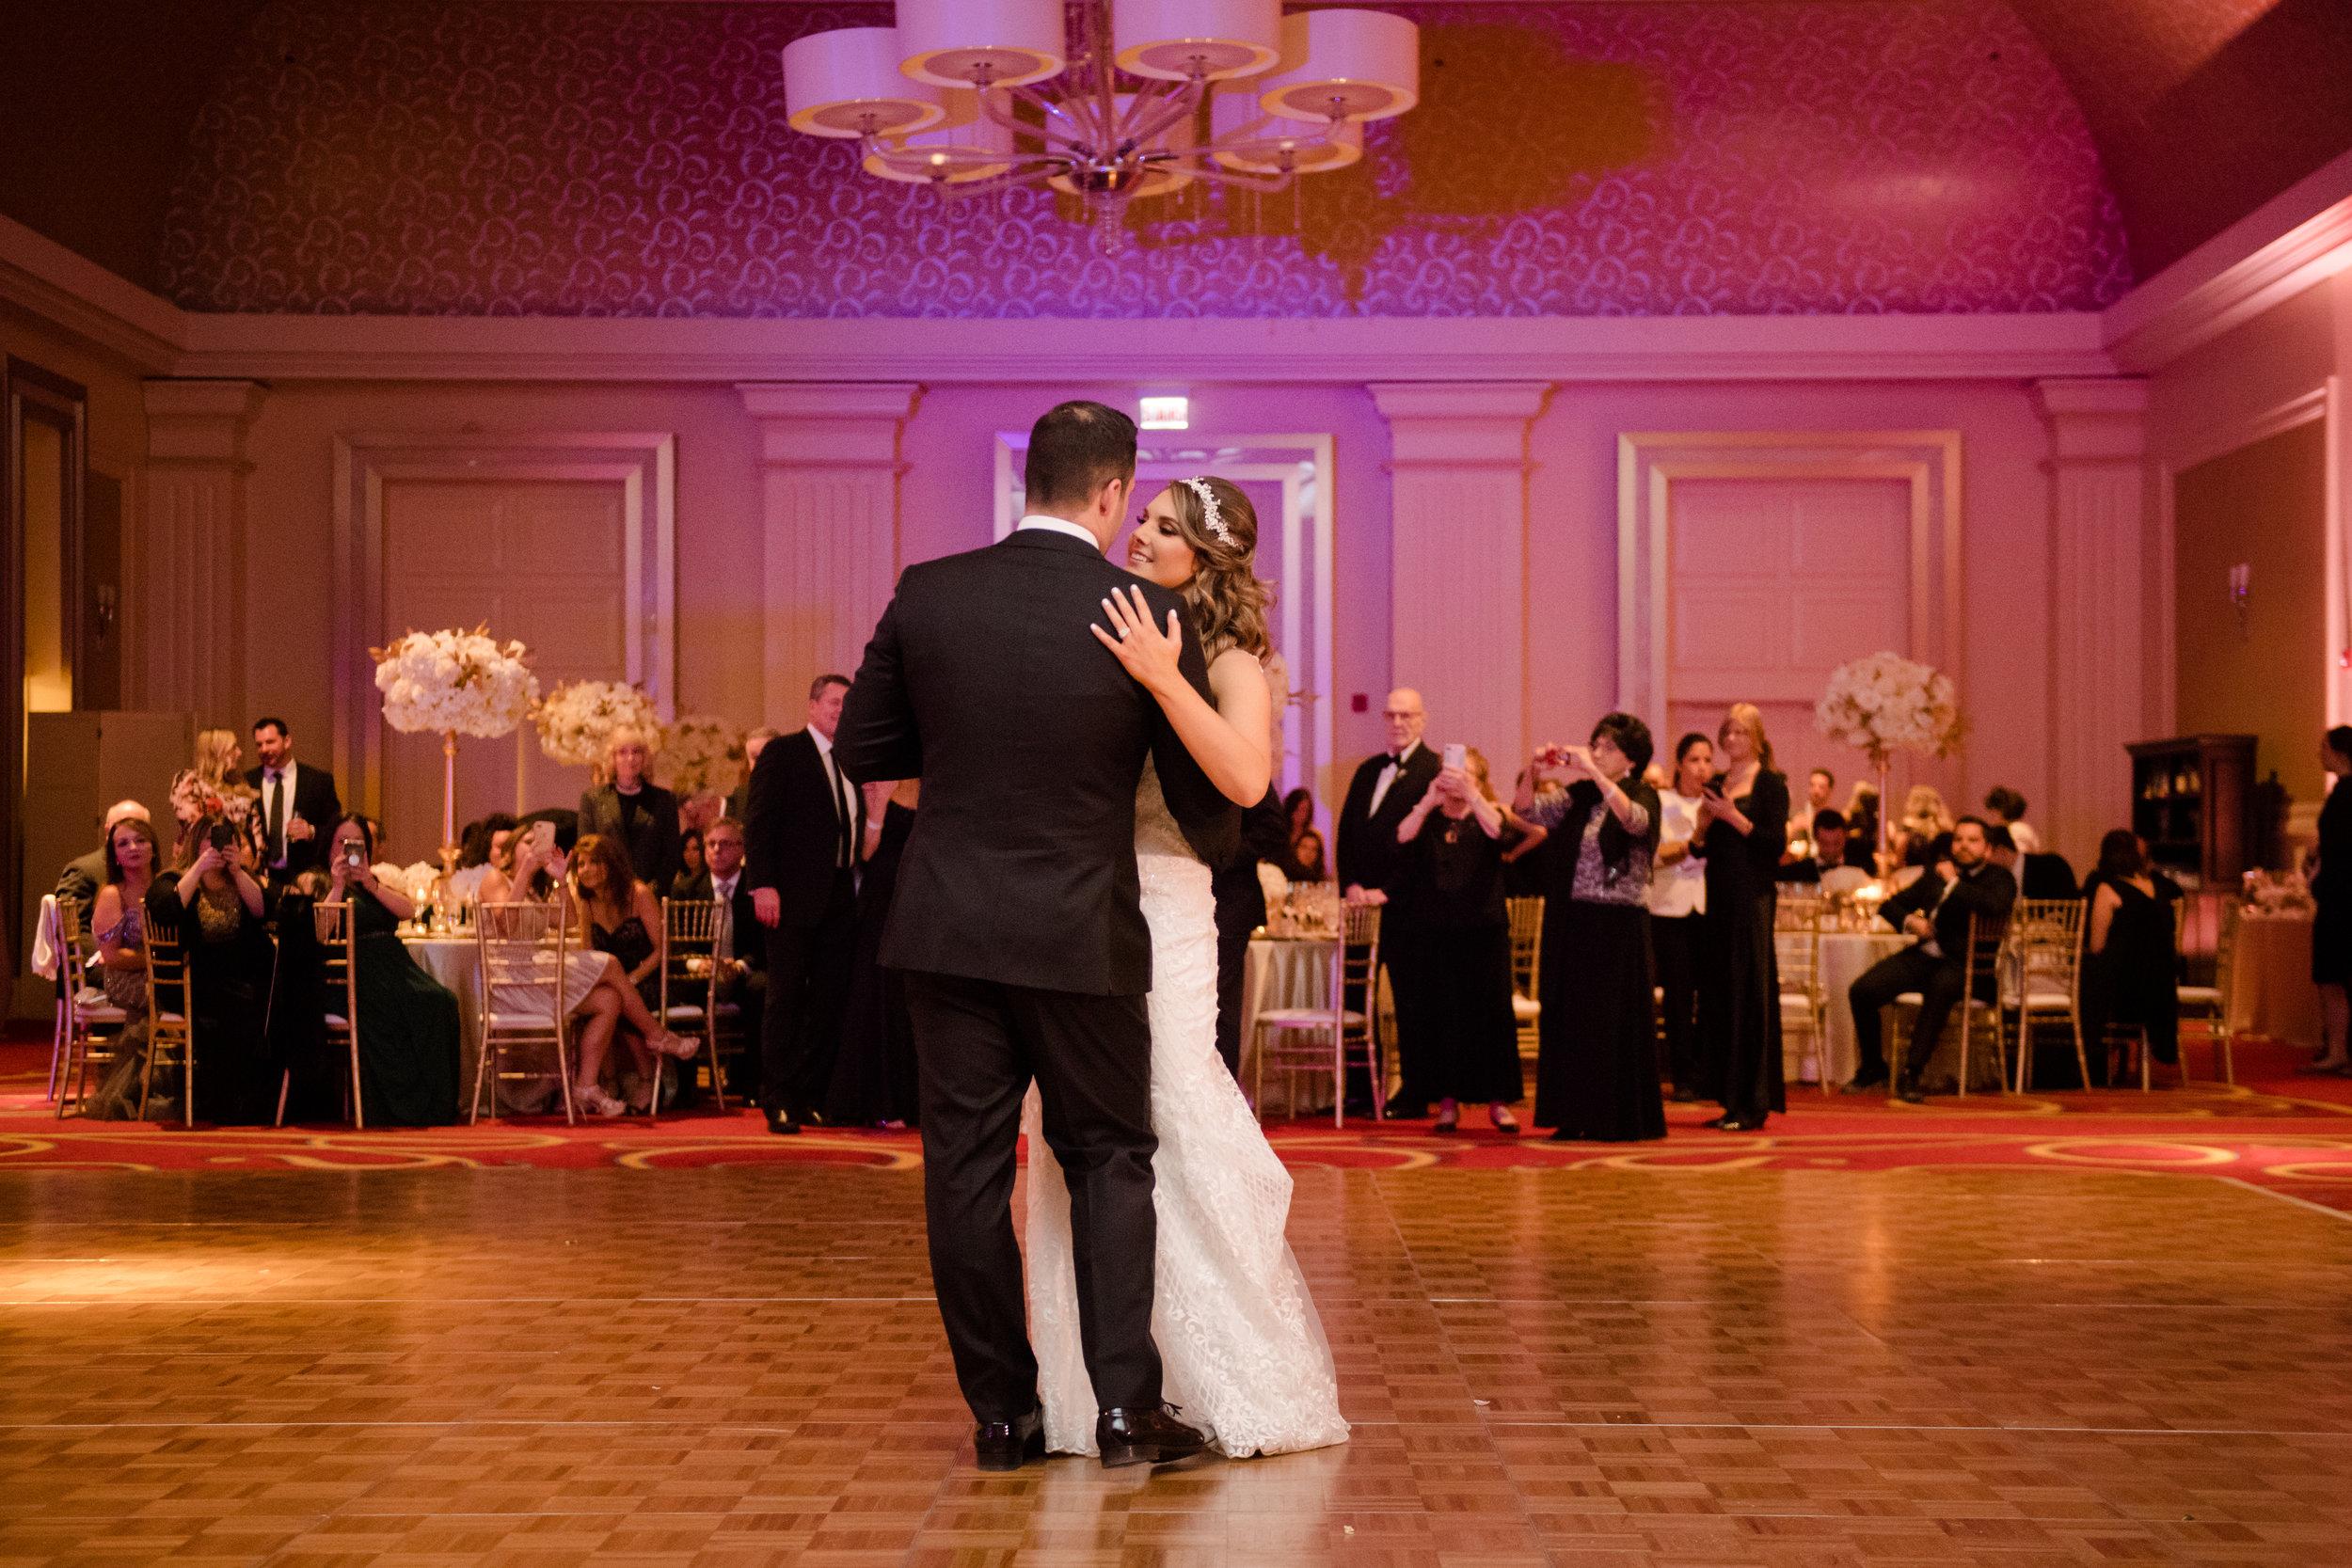 Elegant wedding at the JW Marriott Chicago28.jpg